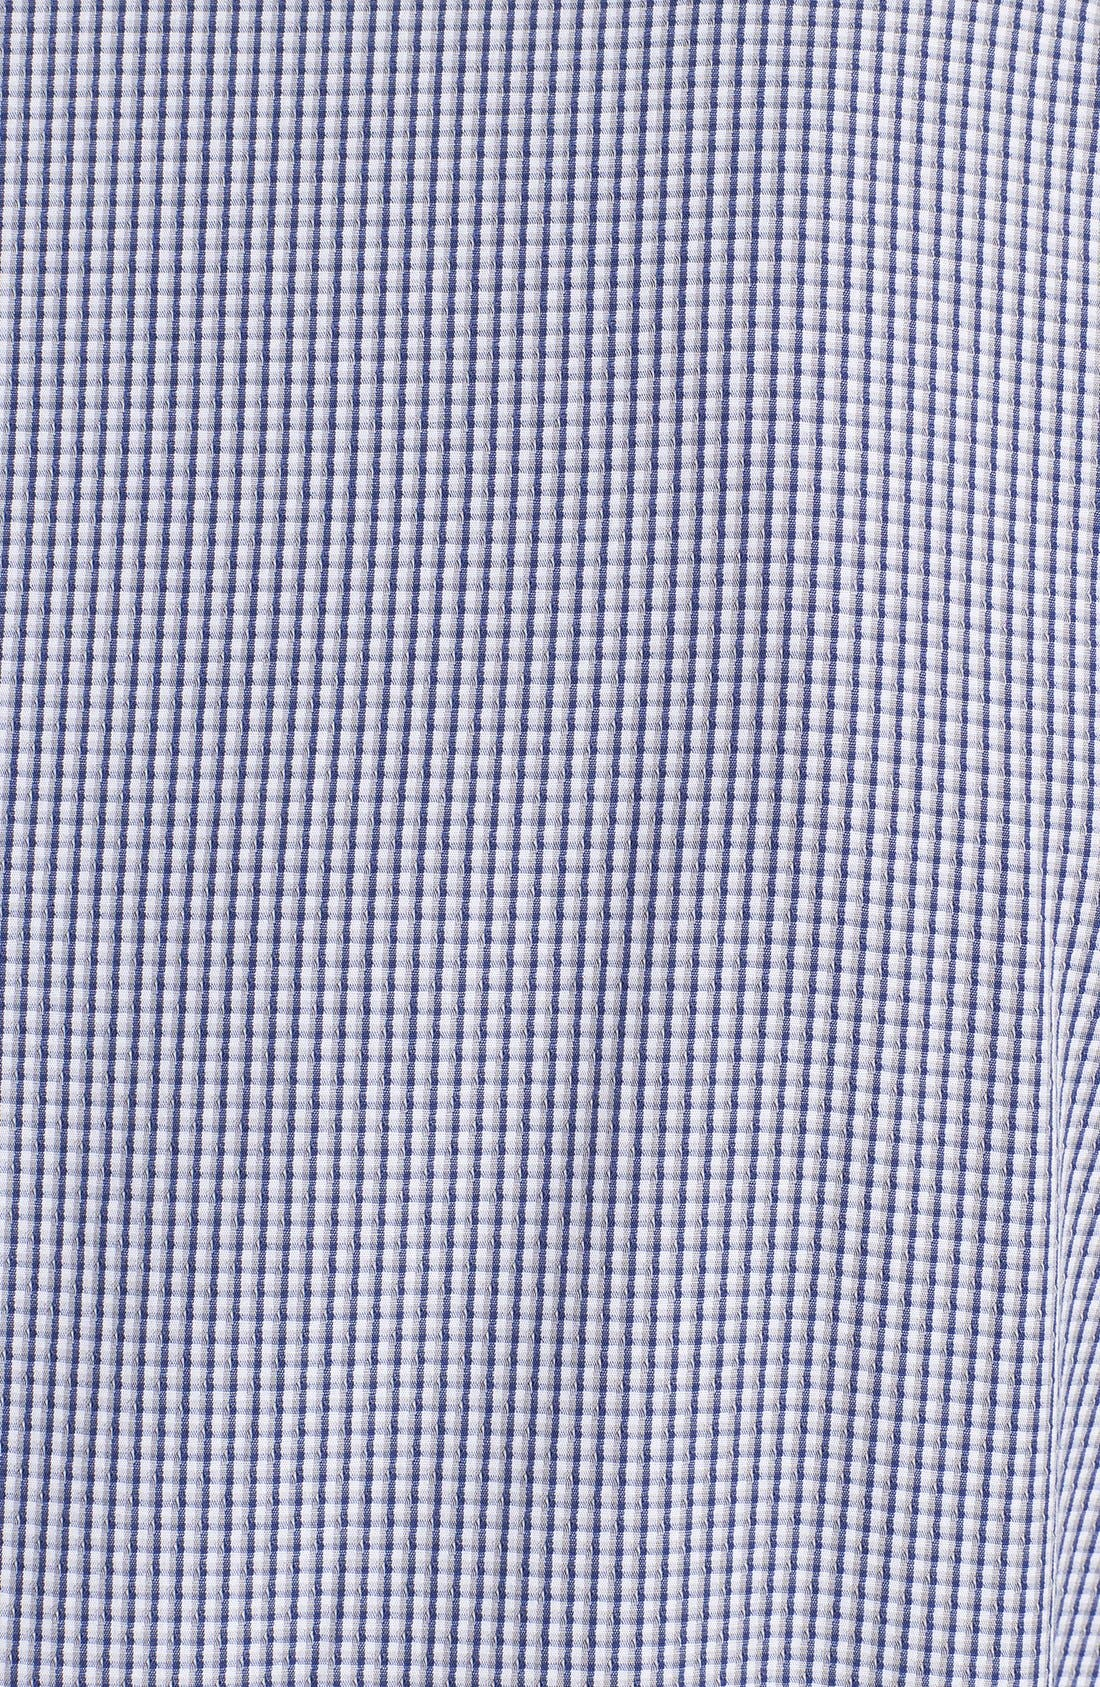 Alternate Image 3  - Zachary Prell 'Boudreau' Sport Shirt